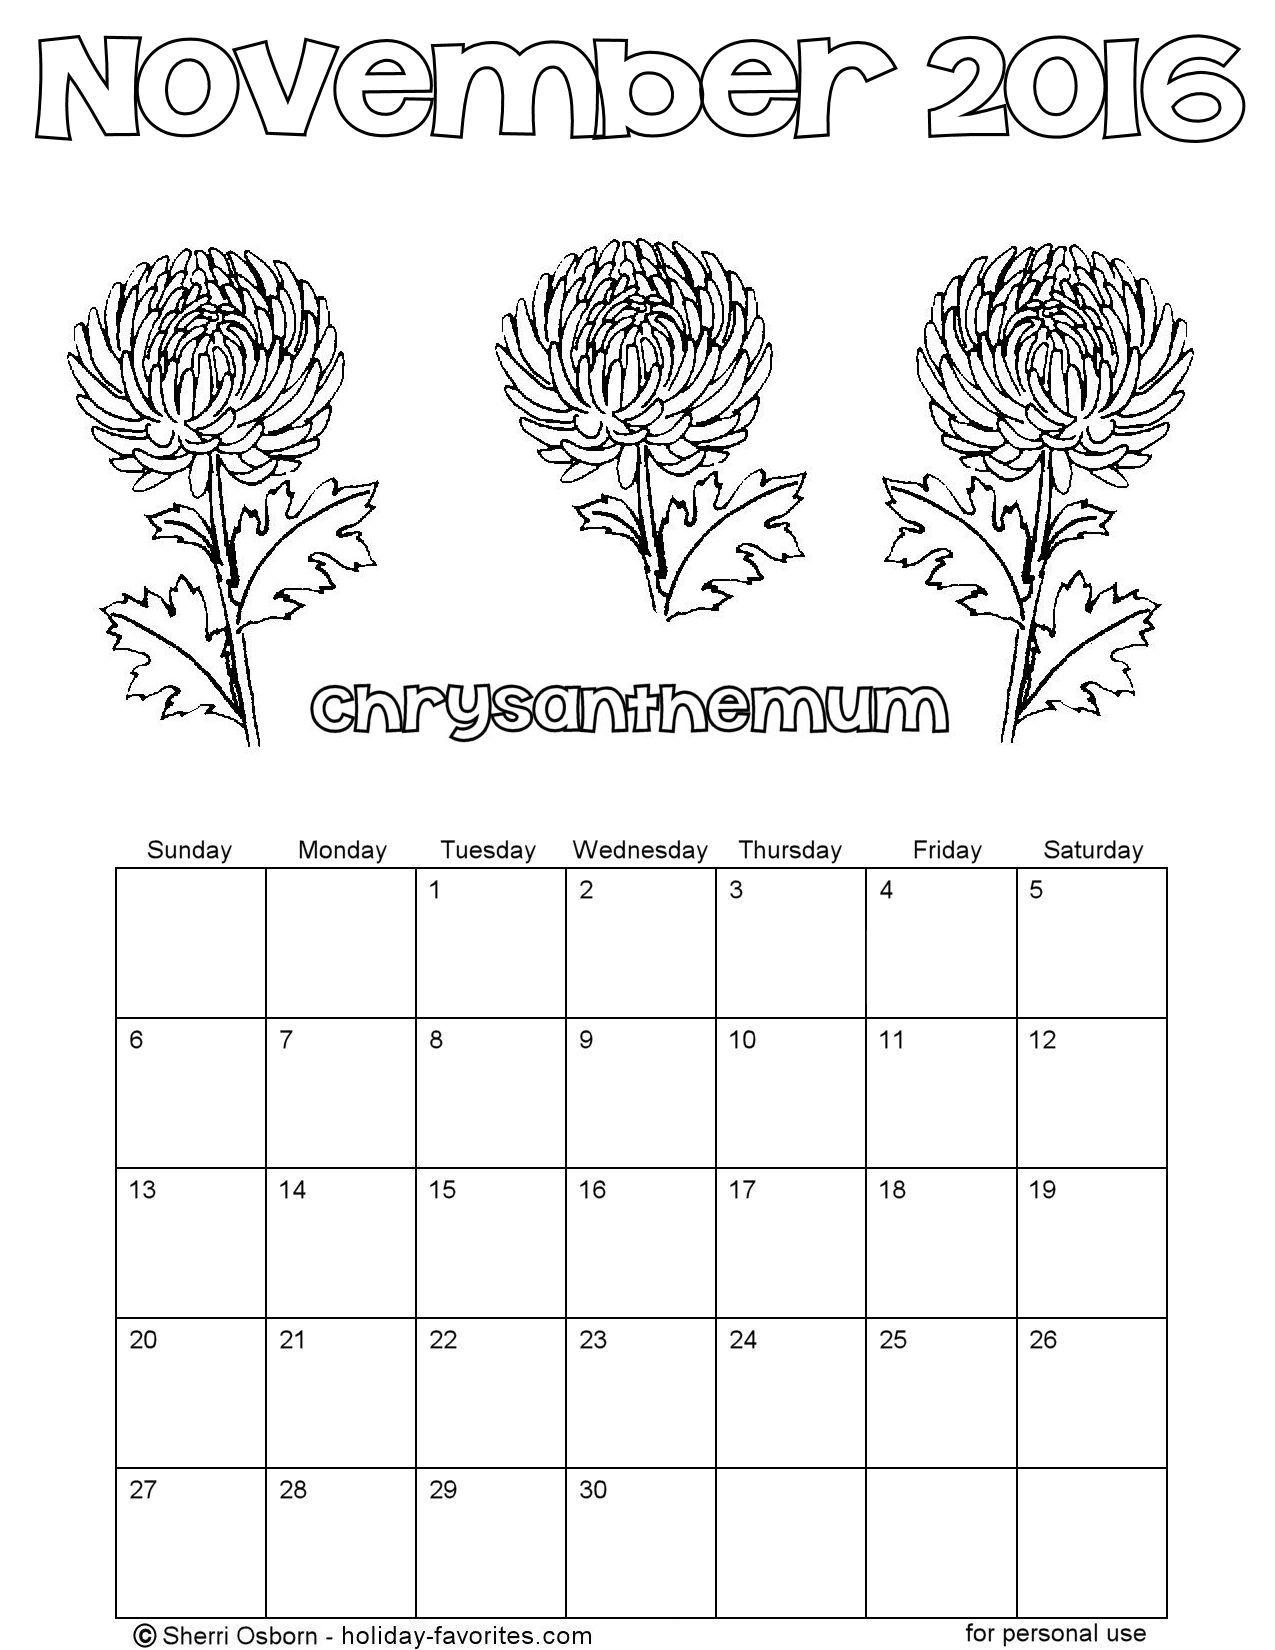 November 2016 Flower Coloring Calendar Page